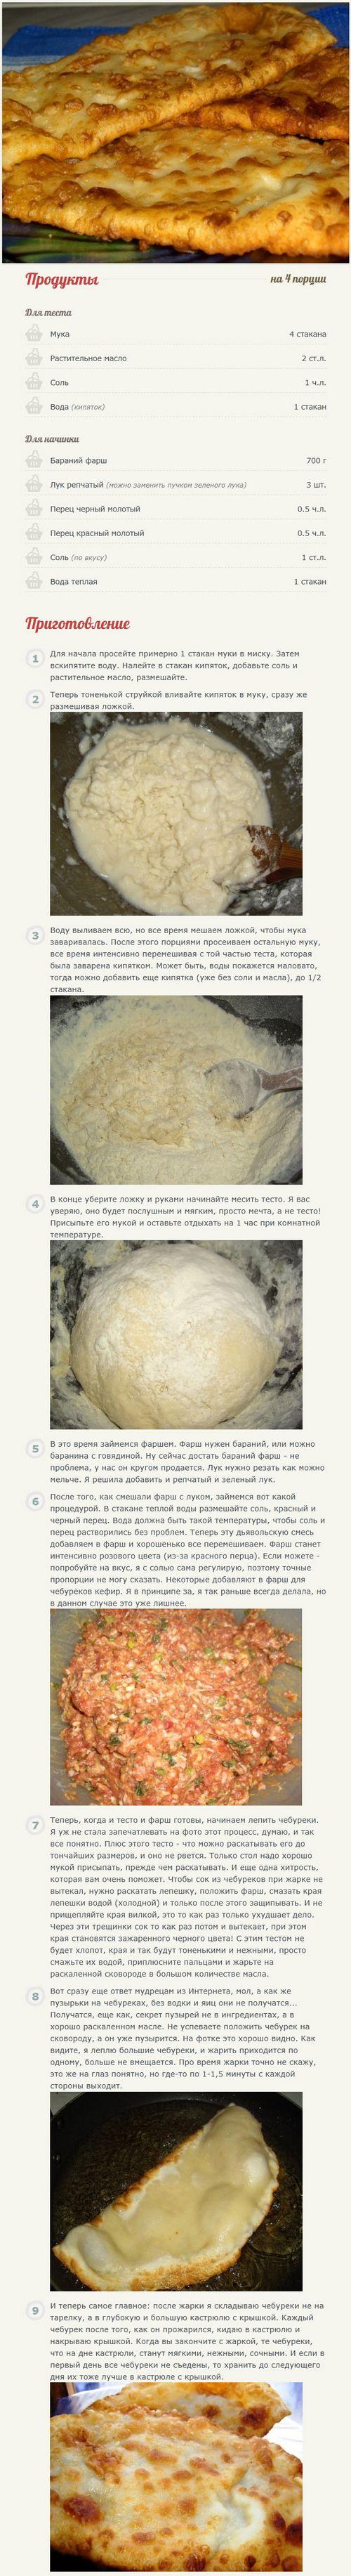 Рецепт заварного теста для чебуреков с мясом